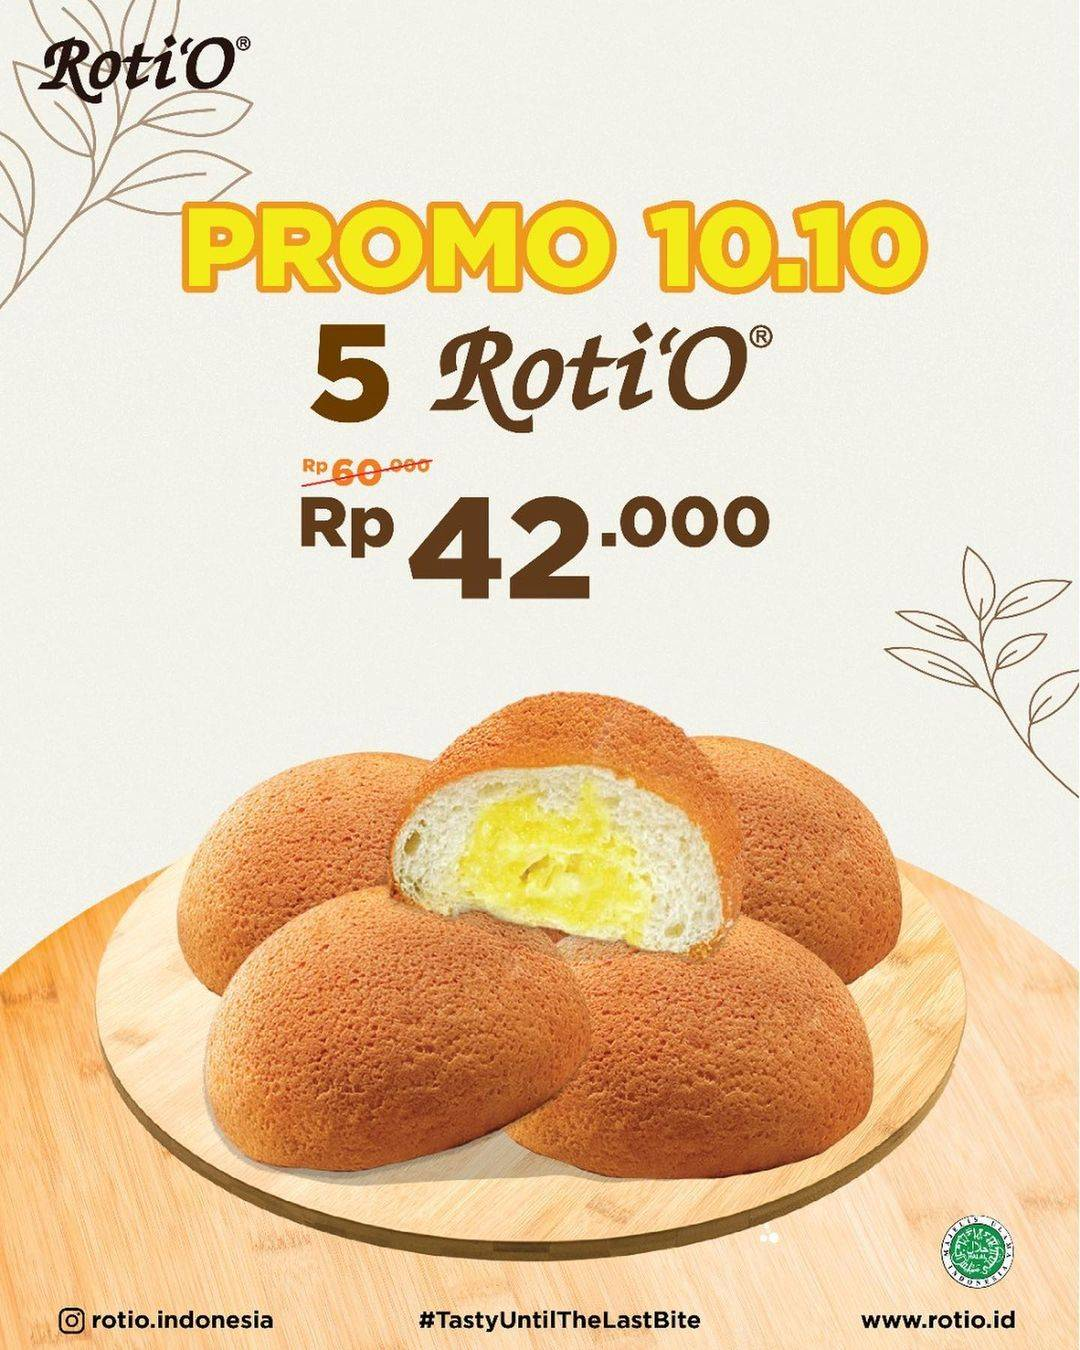 Promo diskon Promo Roti'O 10.10 Spesial